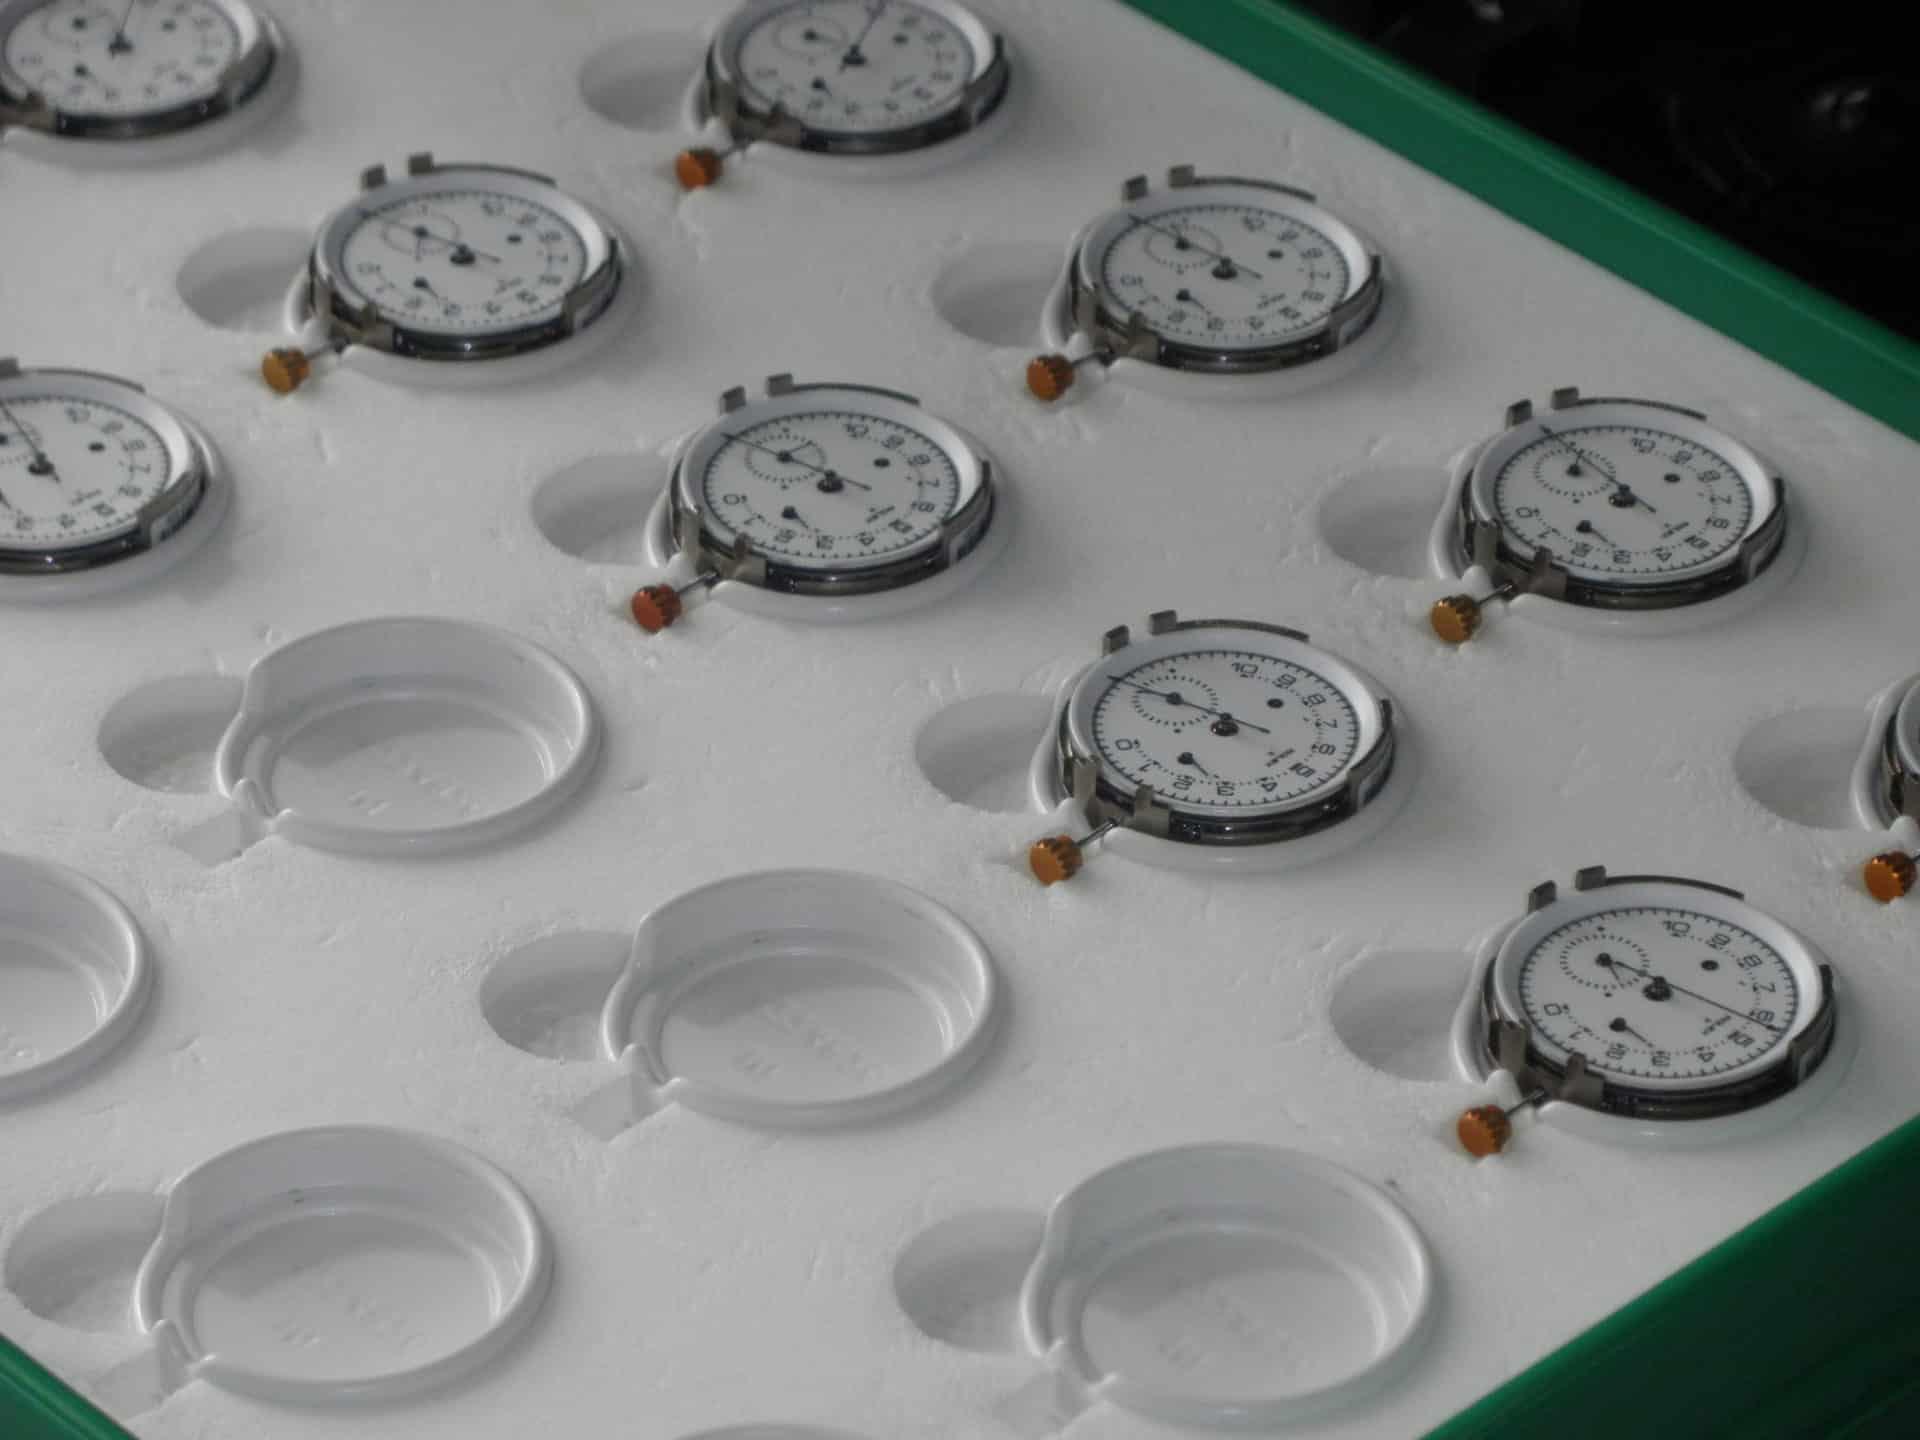 Rolex Biel Kaliber 4130 Check für COSC Foto GLB